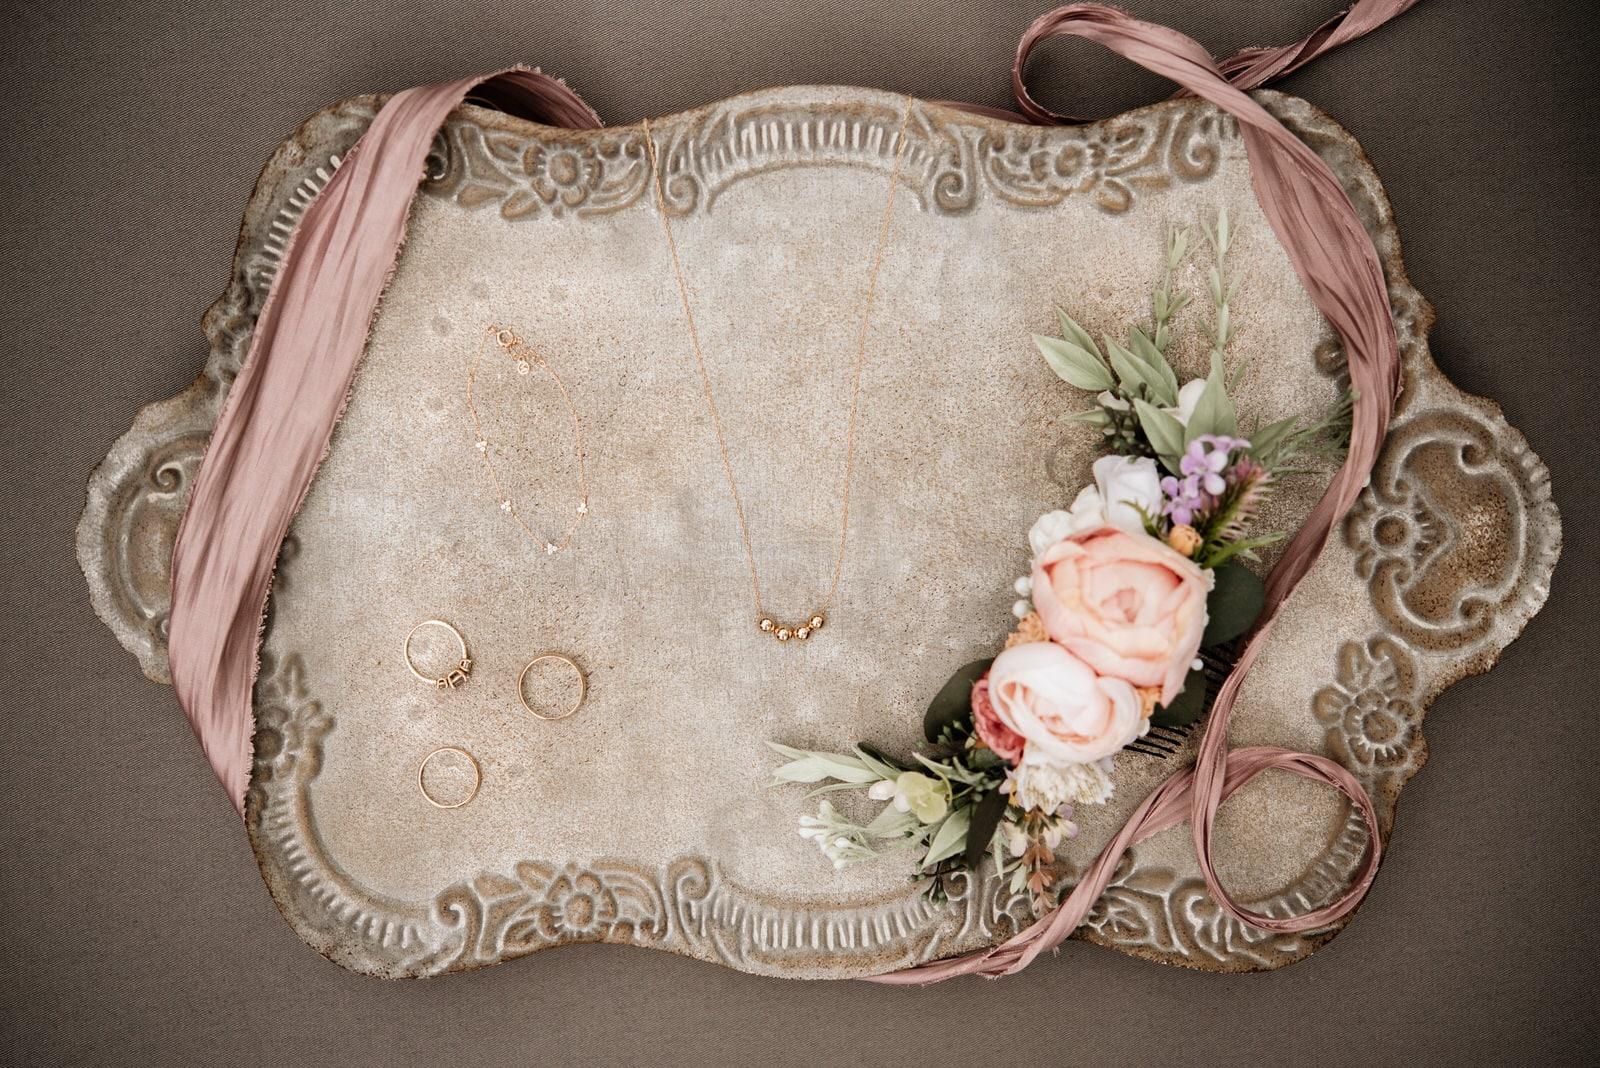 Bridal Detail Flat Lay Wedding Photography